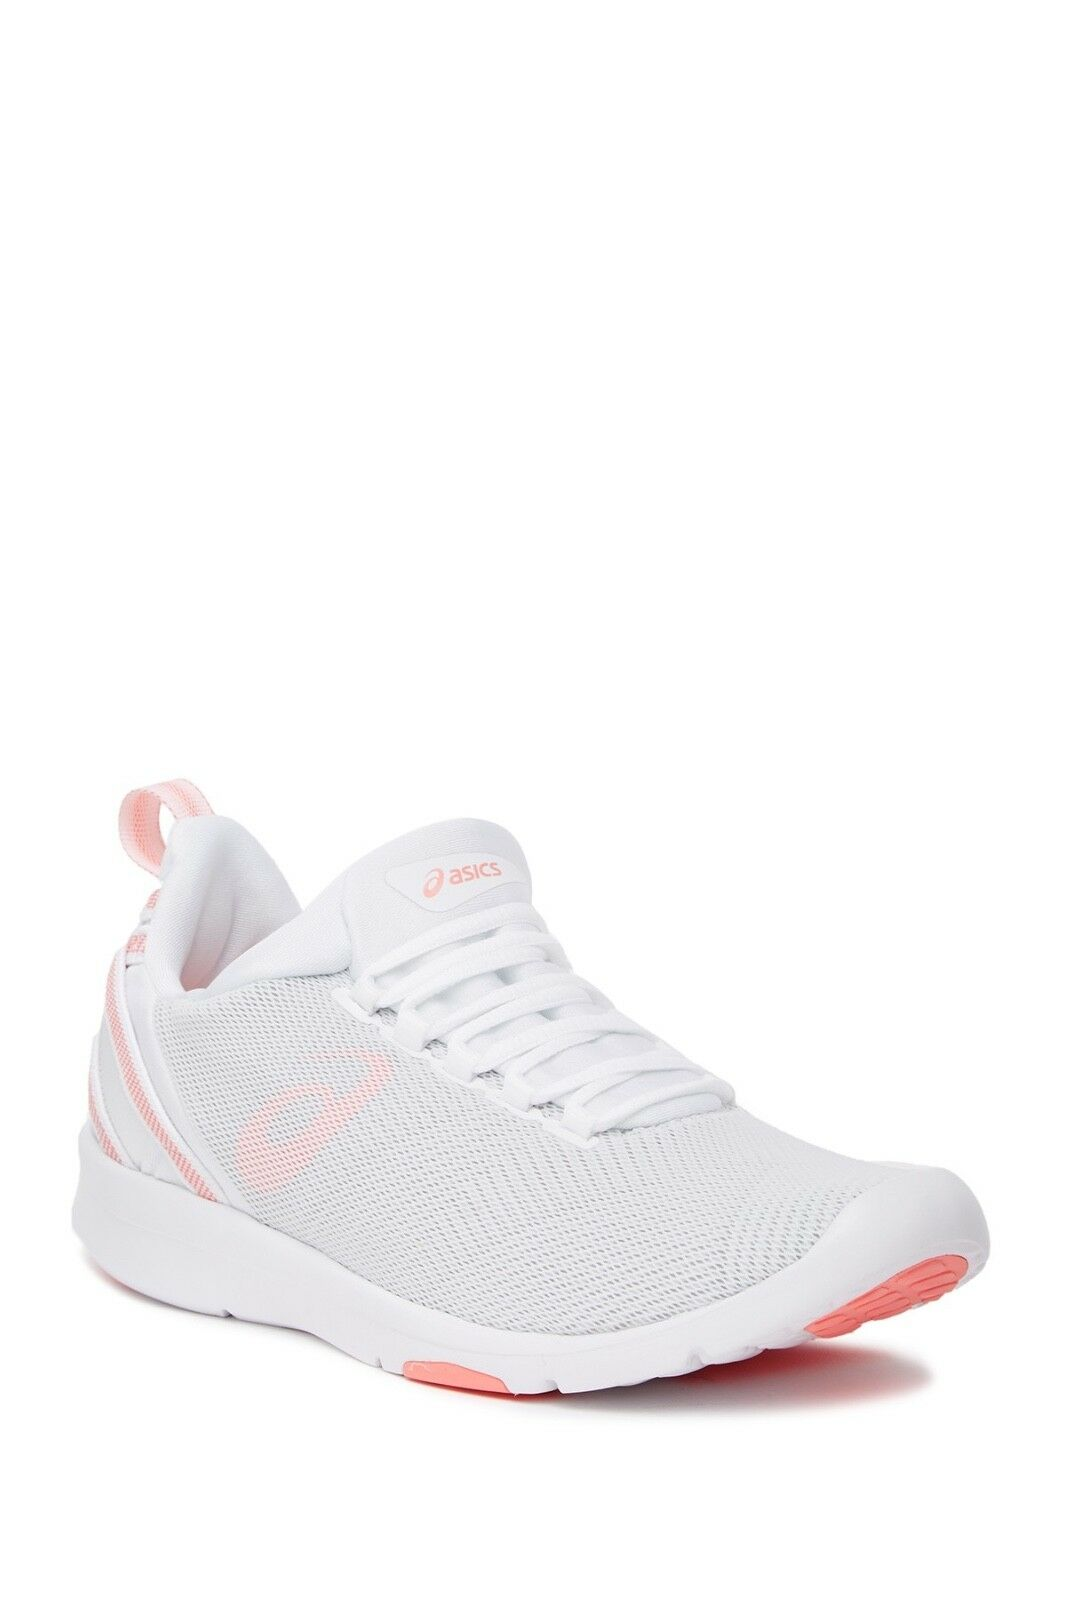 ASICS GEL Fit Training sana 3 Cross Training Fit sneaker Blanco / Begonia Rosa / Glaciar Gris NIB baratos zapatos de mujer zapatos de mujer 1ceffd